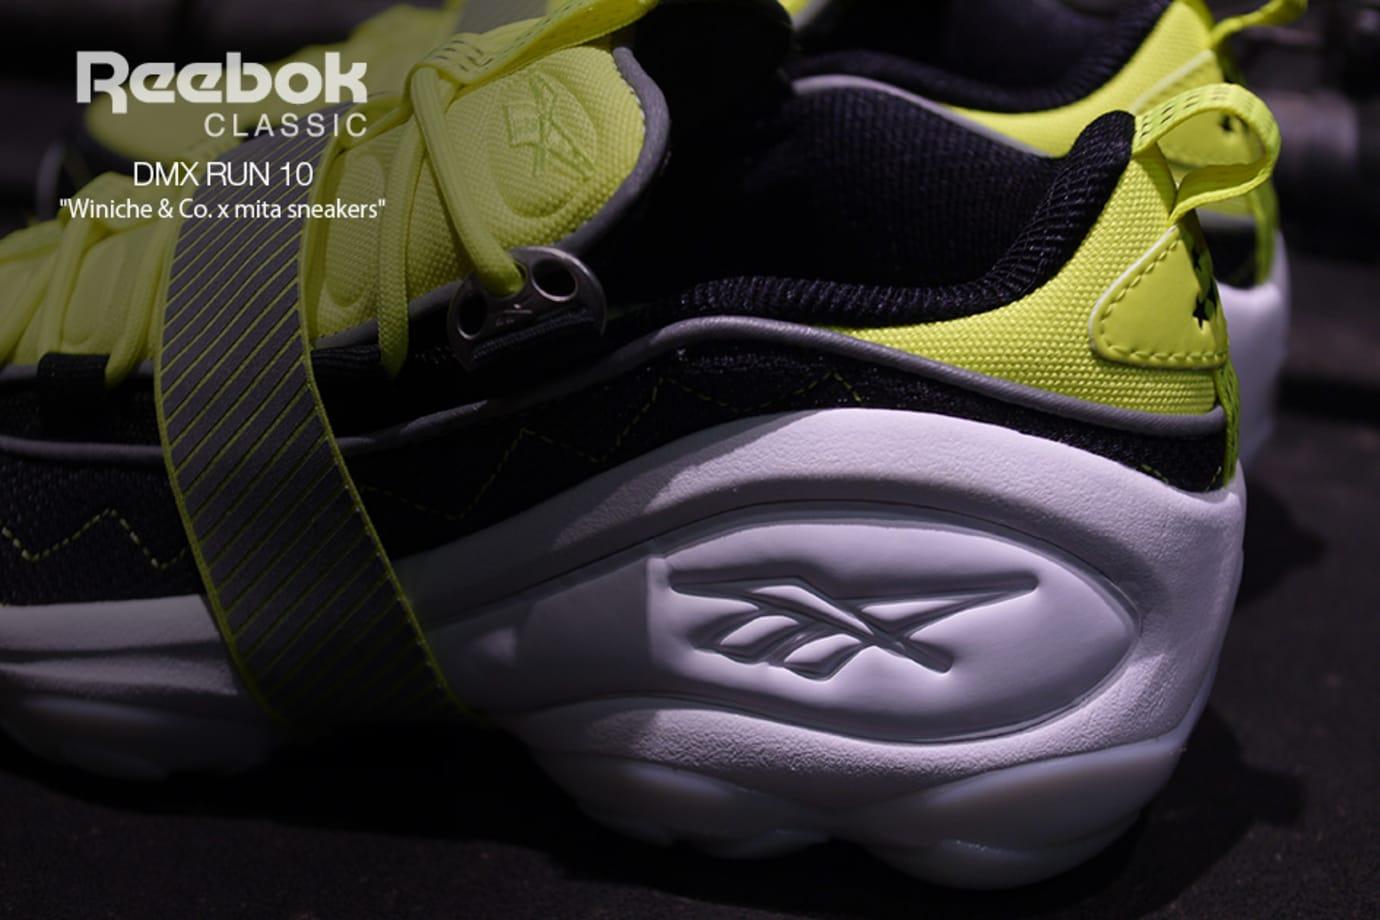 Winiche & Co x Mita Sneakers x Reebok DMX Run 10 (Heel)